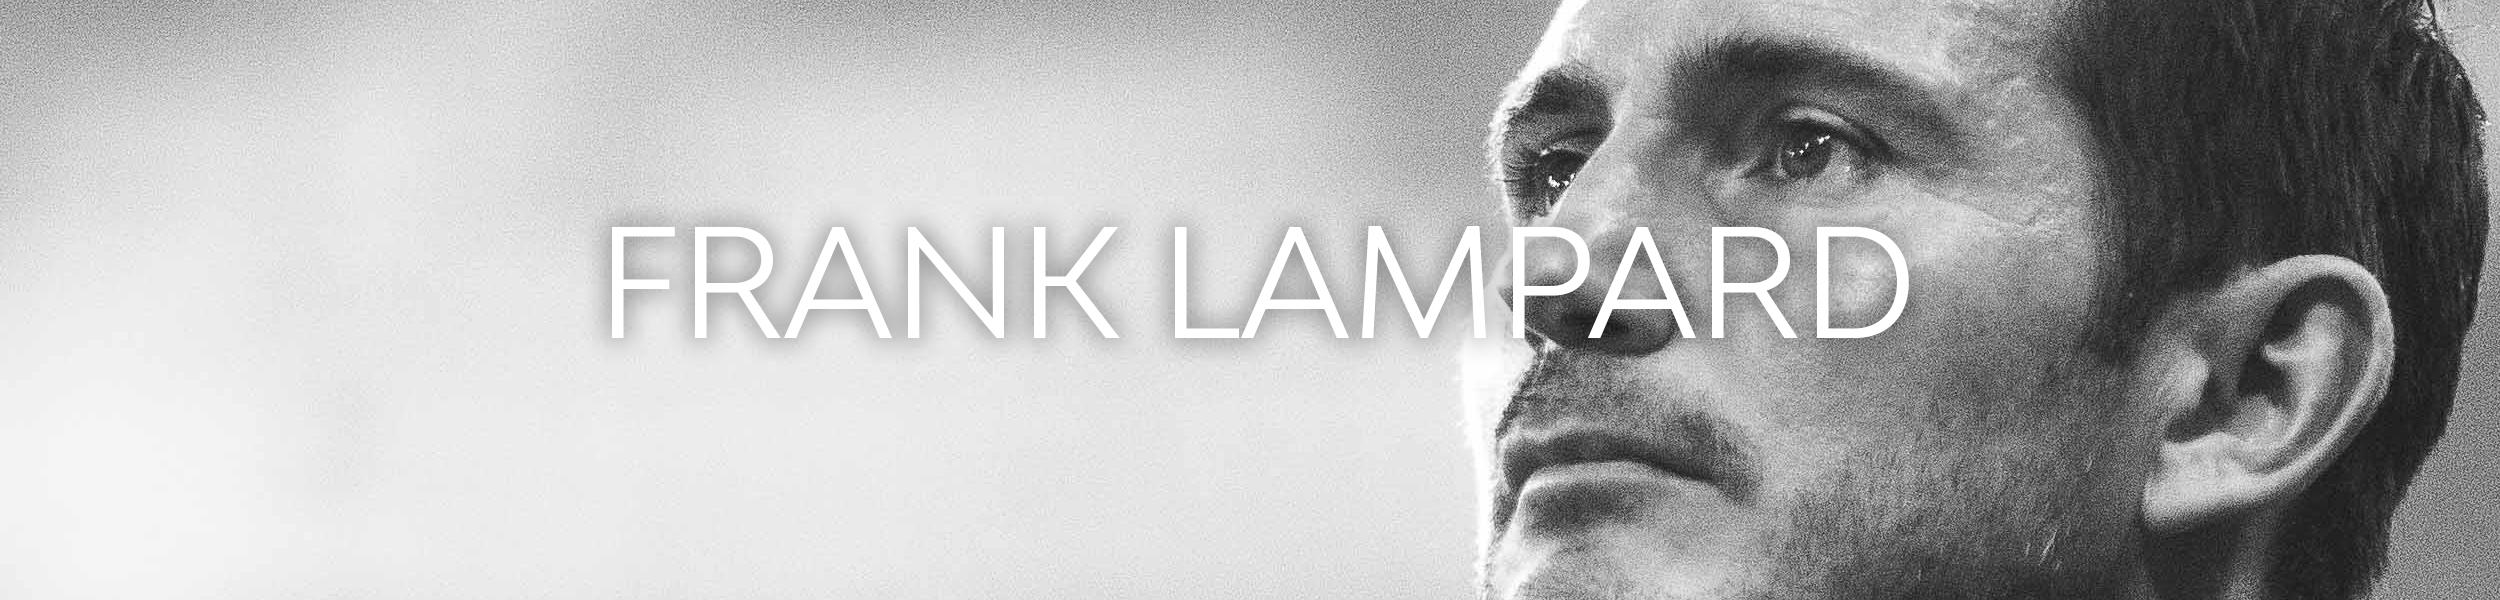 Lampard Header